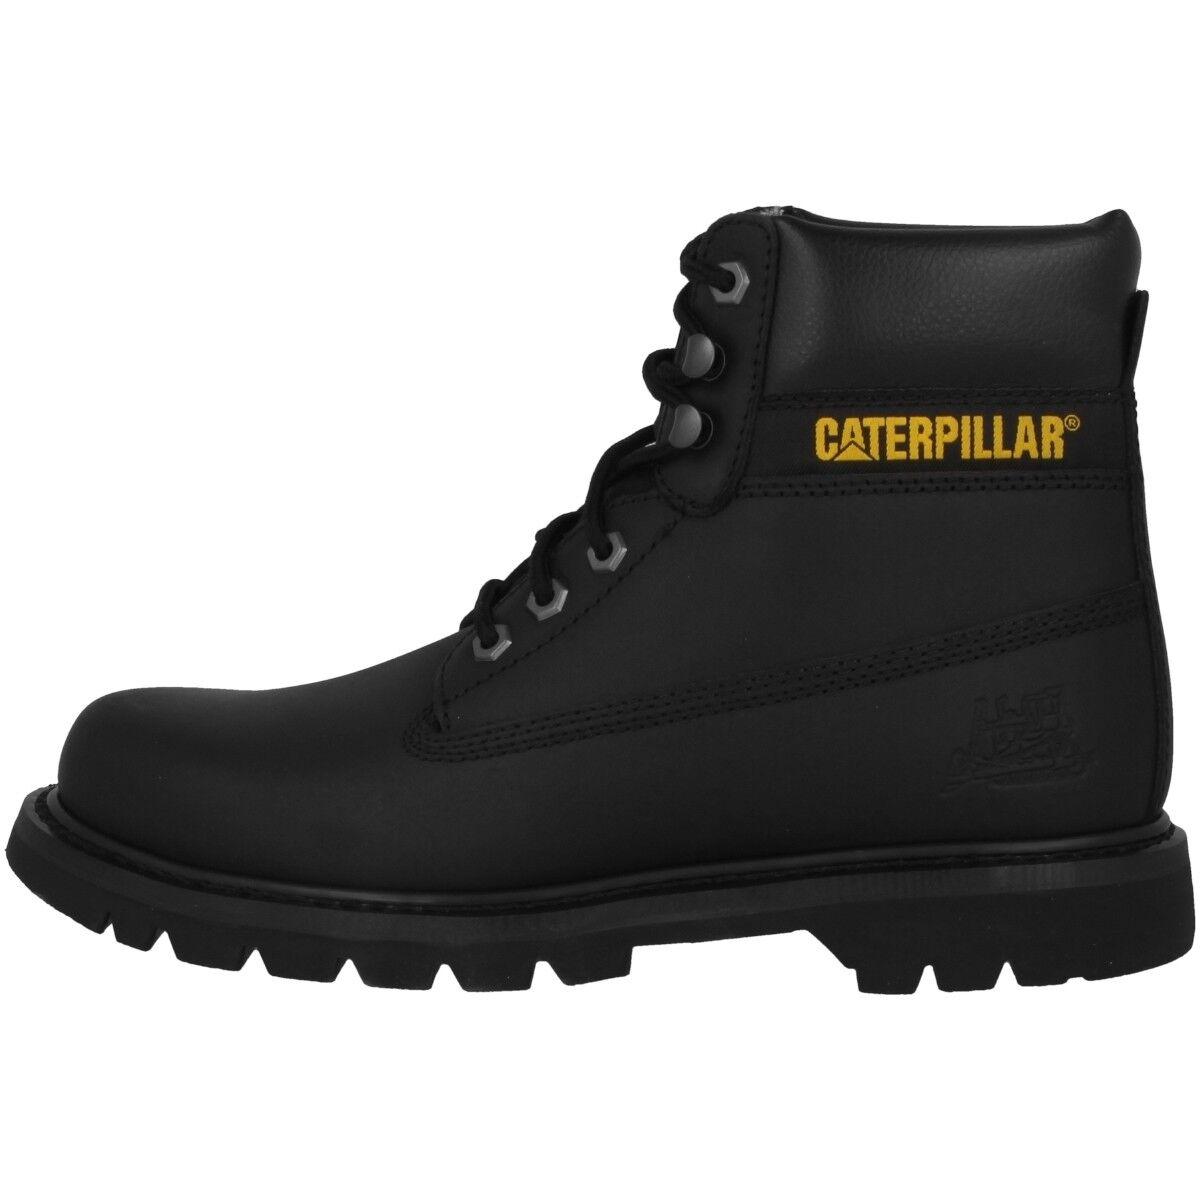 CAT Caterpillar Colorado Stiefel Men Boots Herren Arbeitsschuhe PWC44100-709